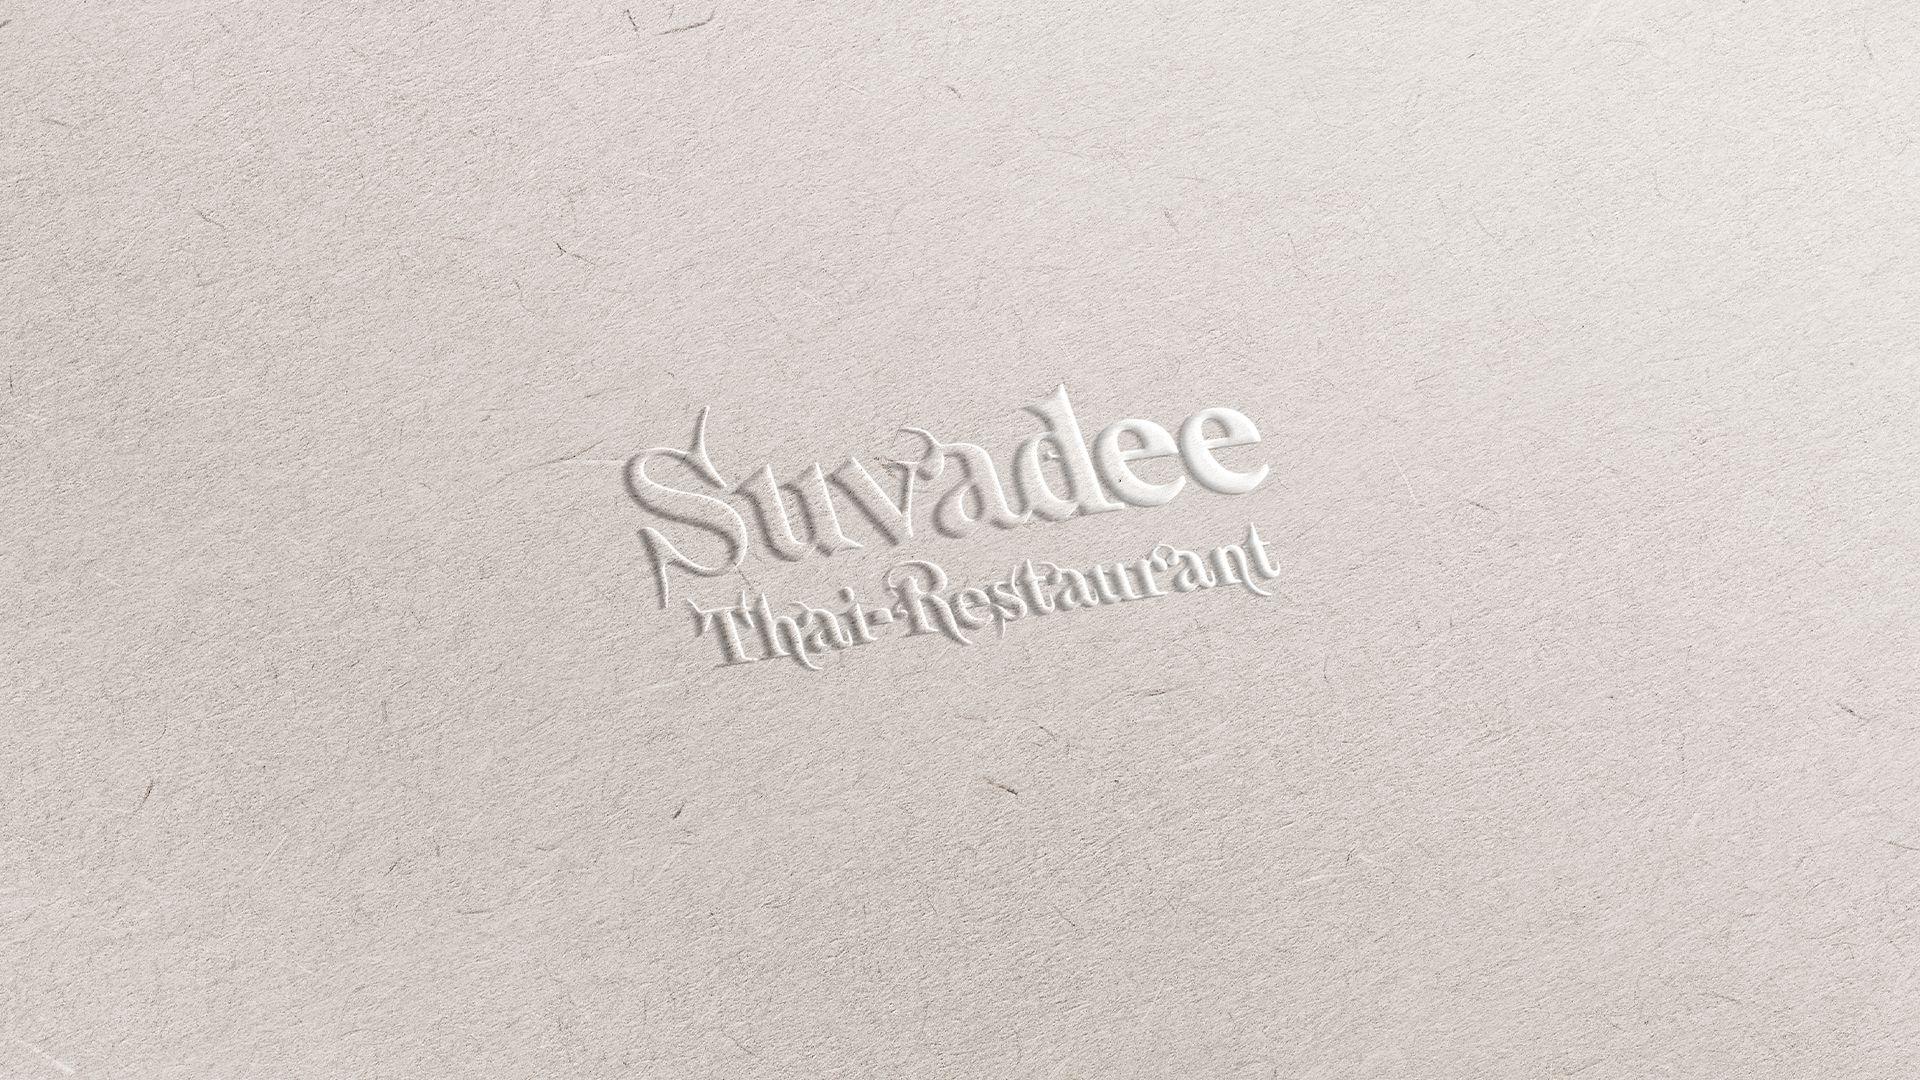 Suvadee Thai Restaurant